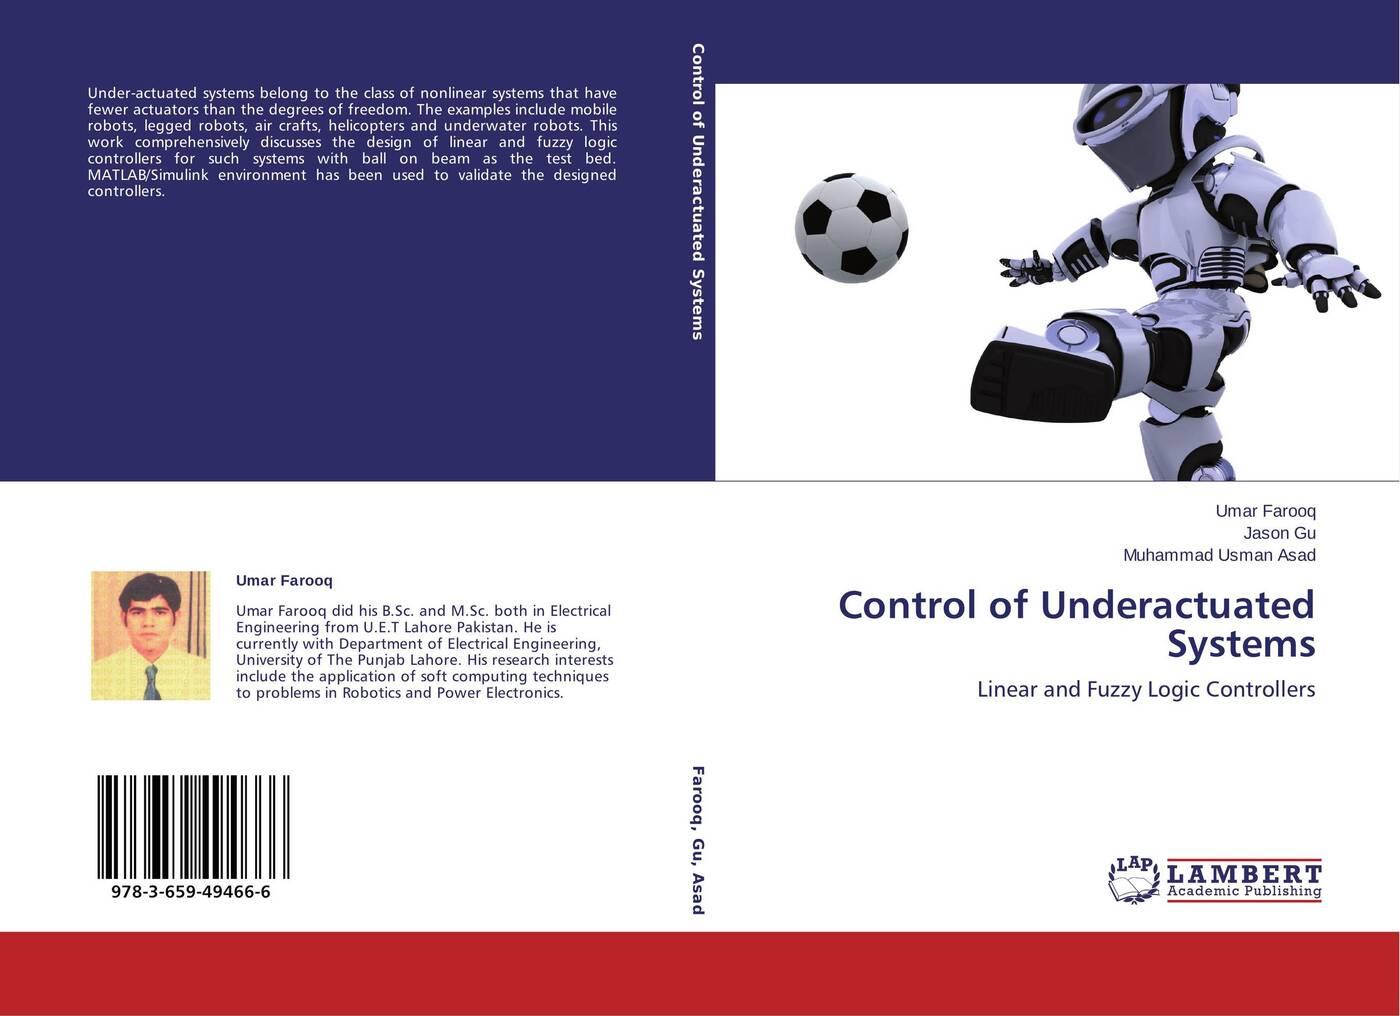 Umar Farooq,Jason Gu and Muhammad Usman Asad Control of Underactuated Systems цена